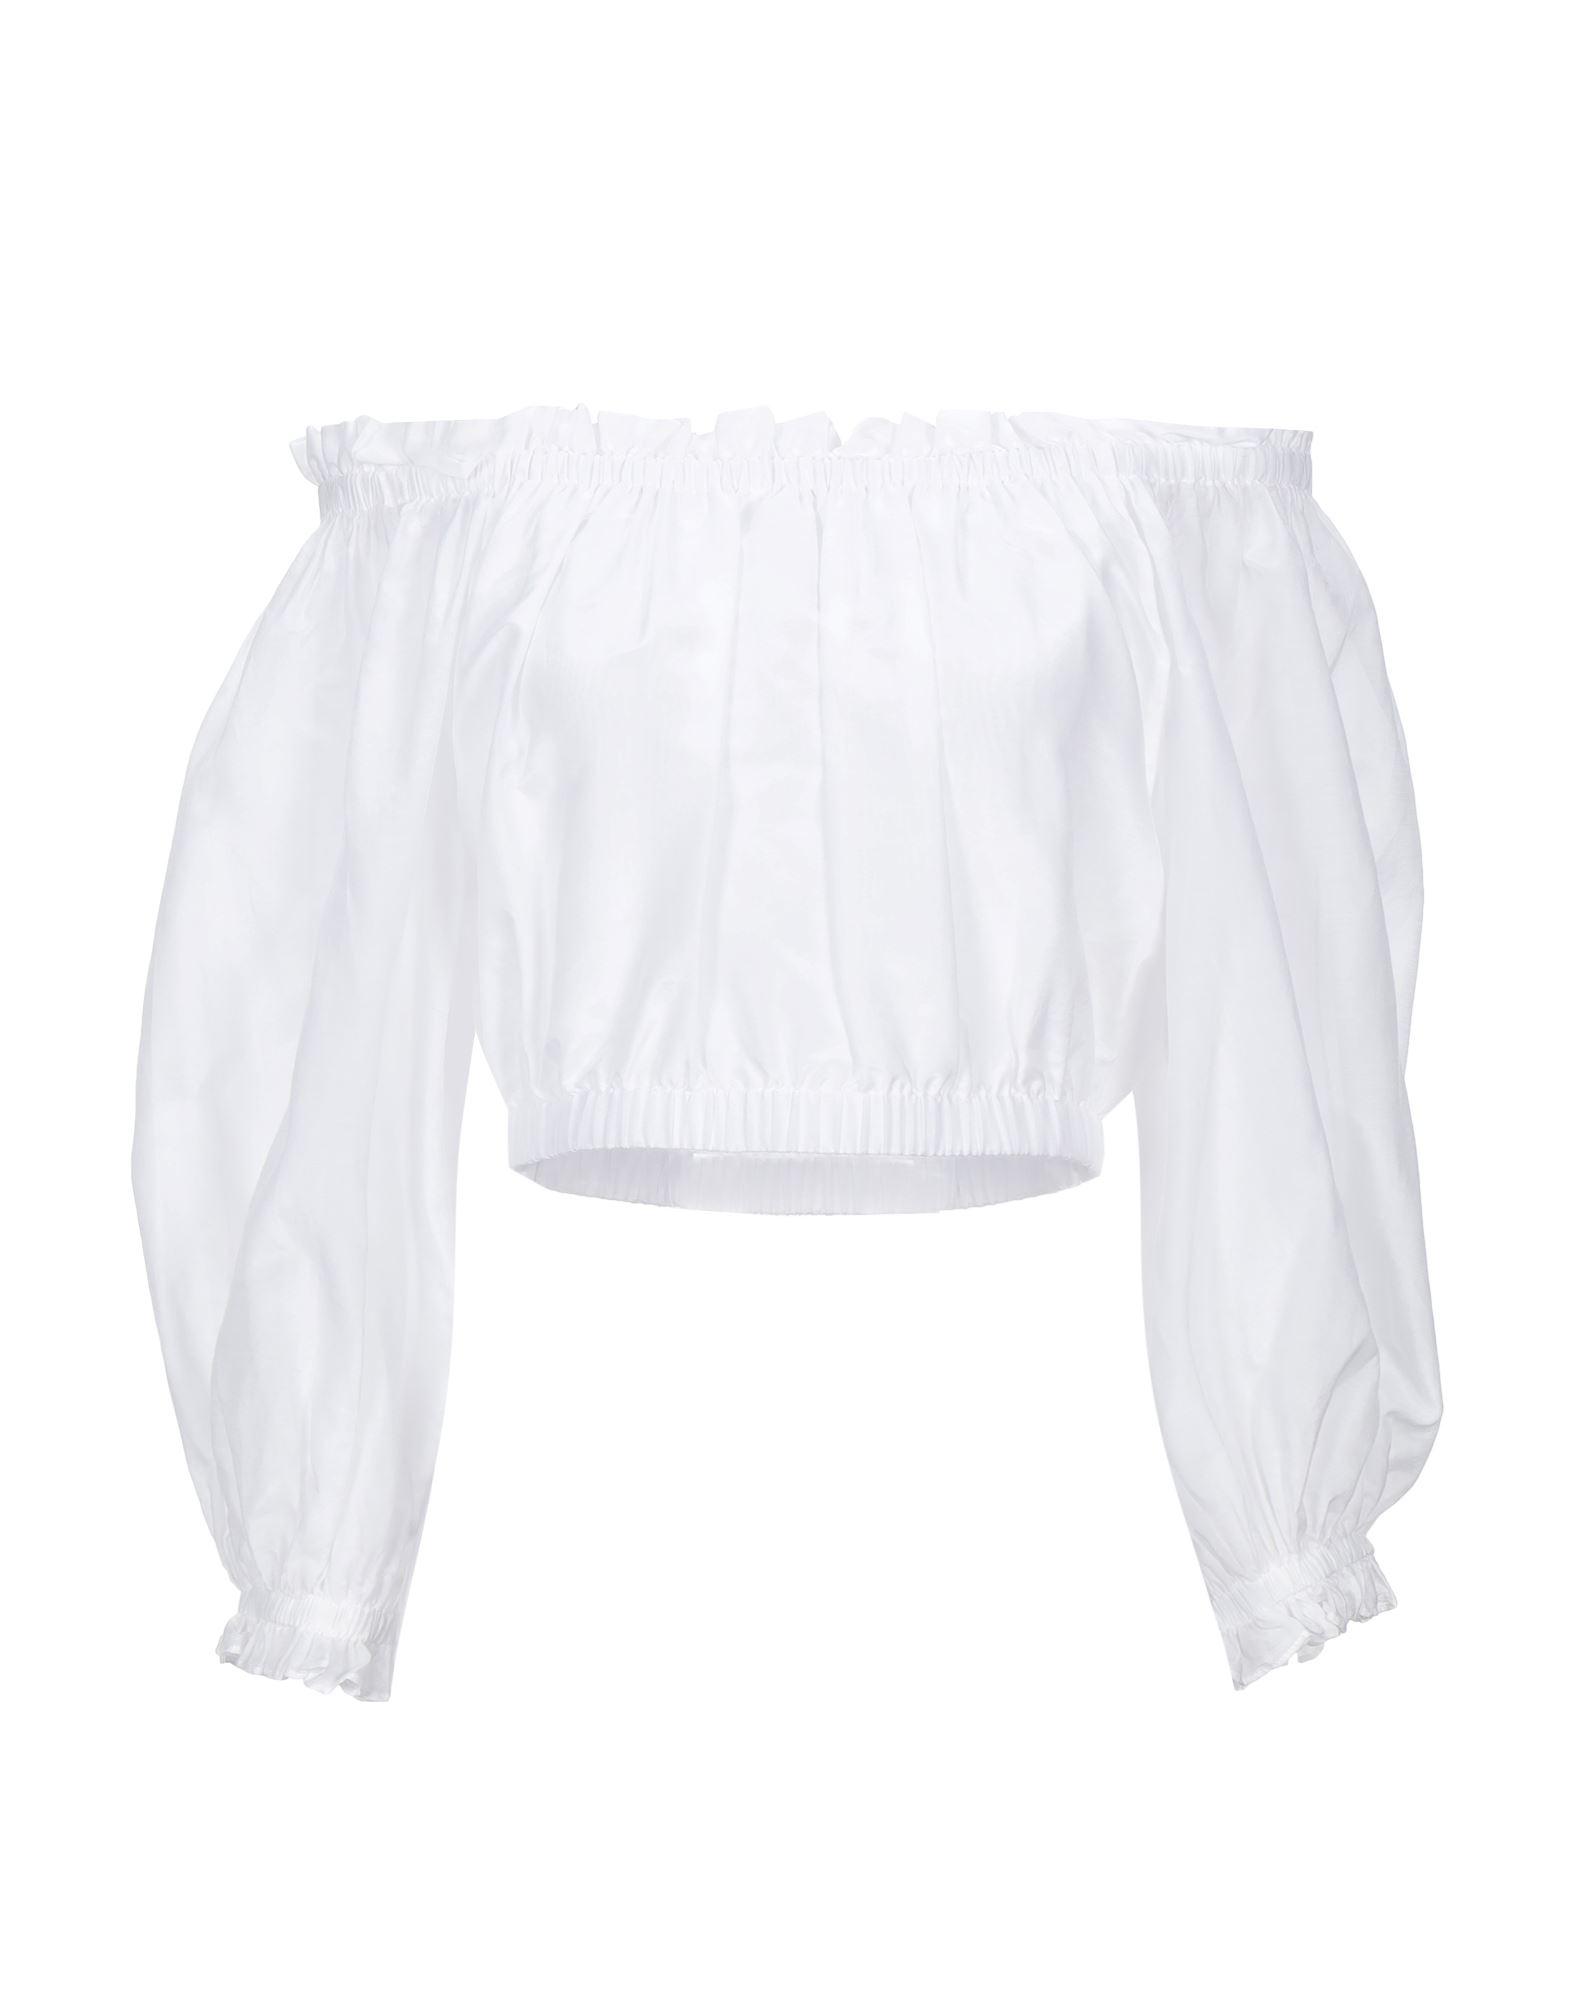 ALICE + OLIVIA Blouses. plain weave, no appliqués, basic solid color, long sleeves, wide neckline, no pockets. 70% Cotton, 30% Silk